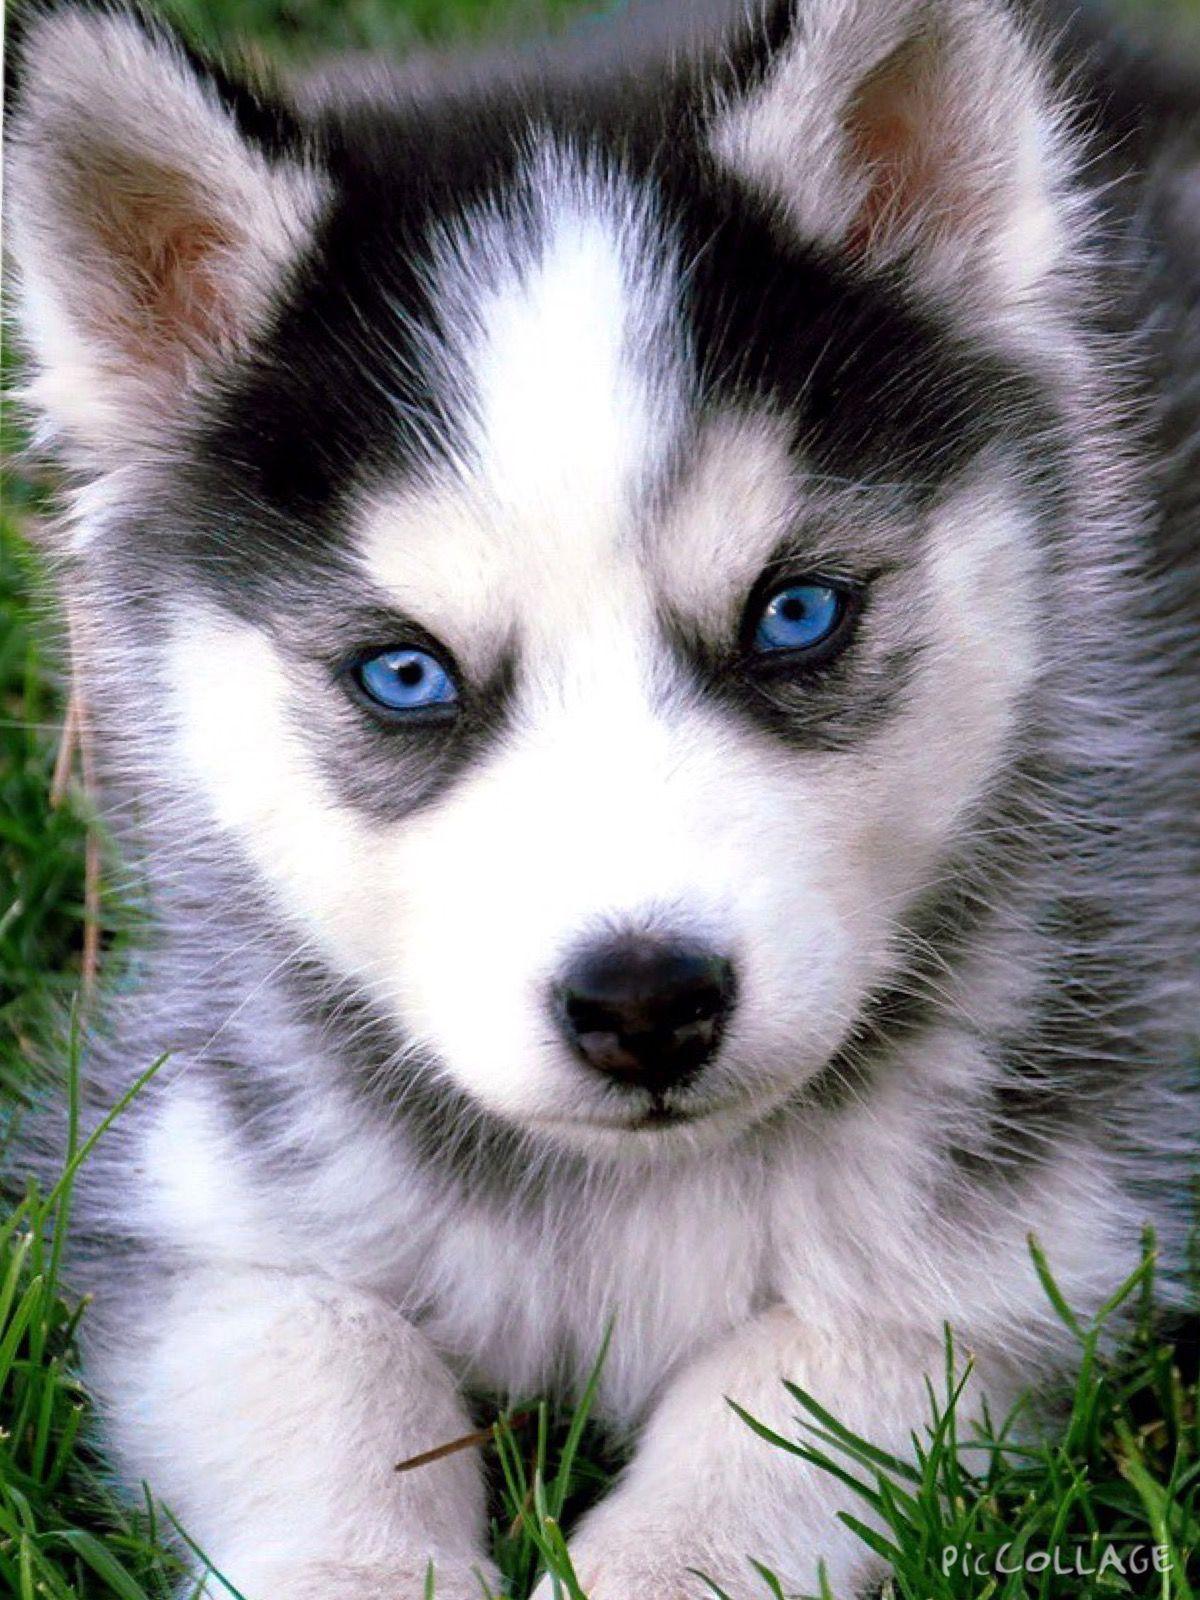 Cute husky puppies image by Nicole on Animals ️ Husky